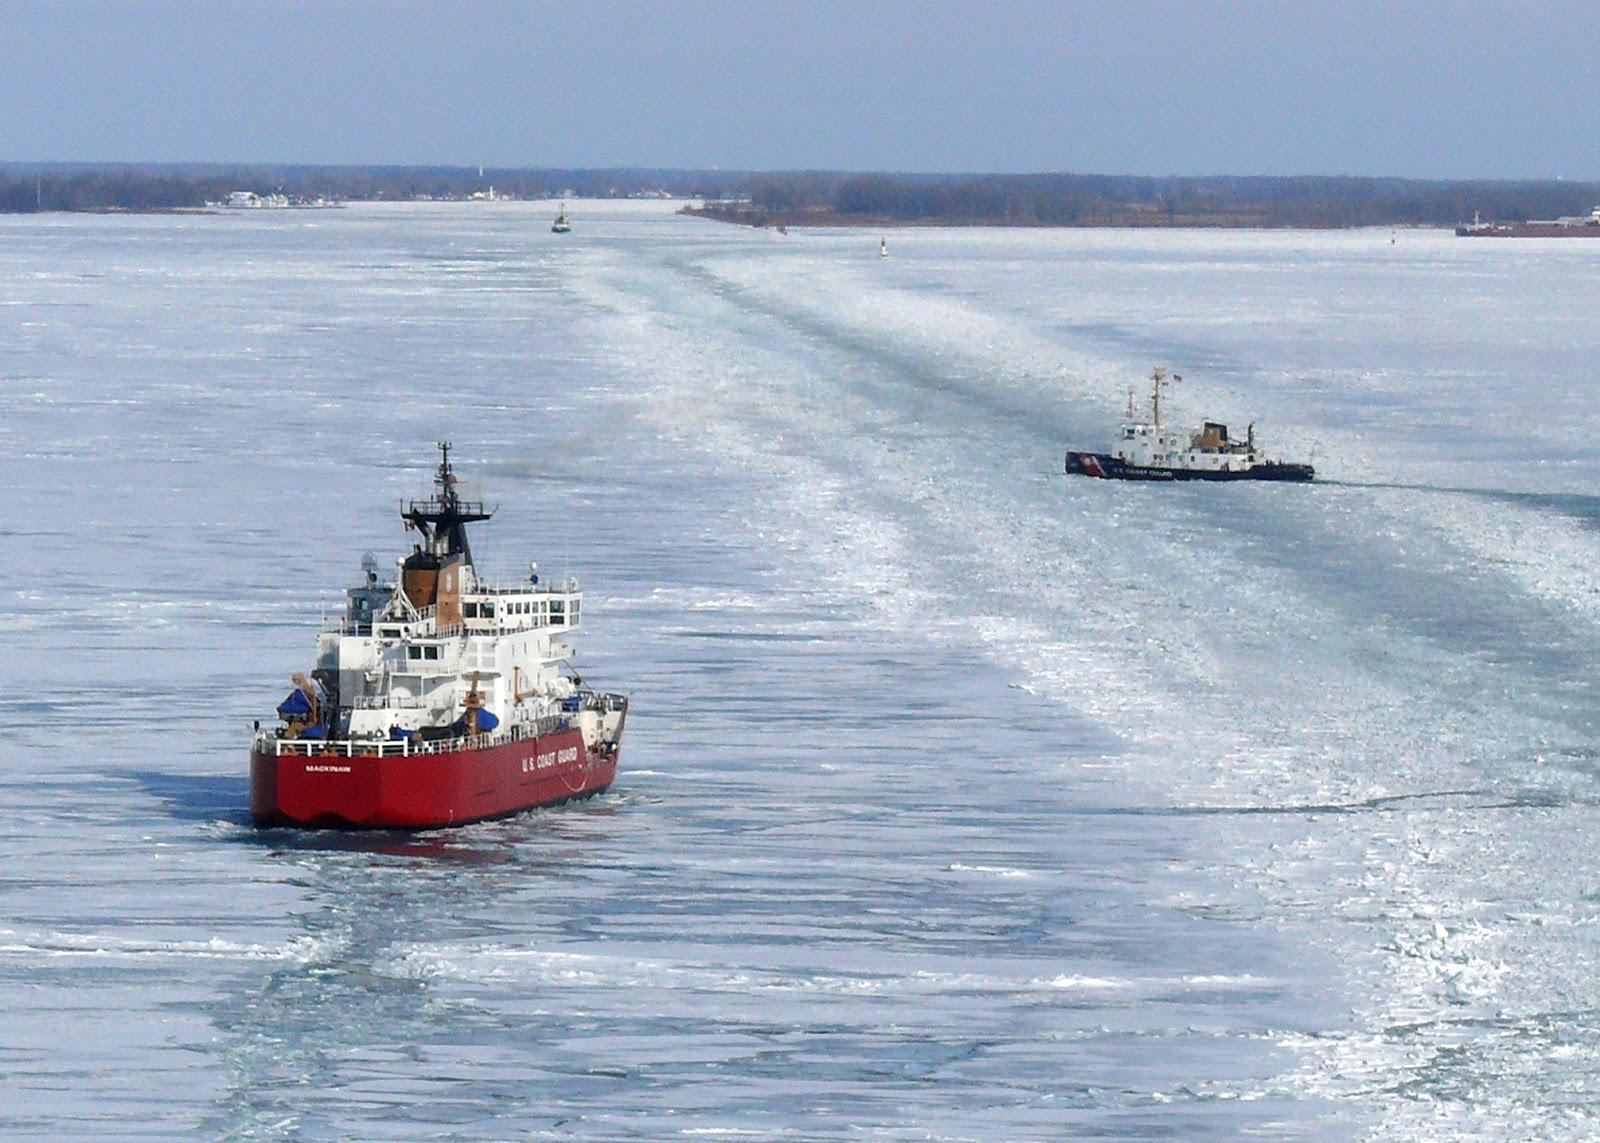 U.S. Coast Guard Ship Mackinaw